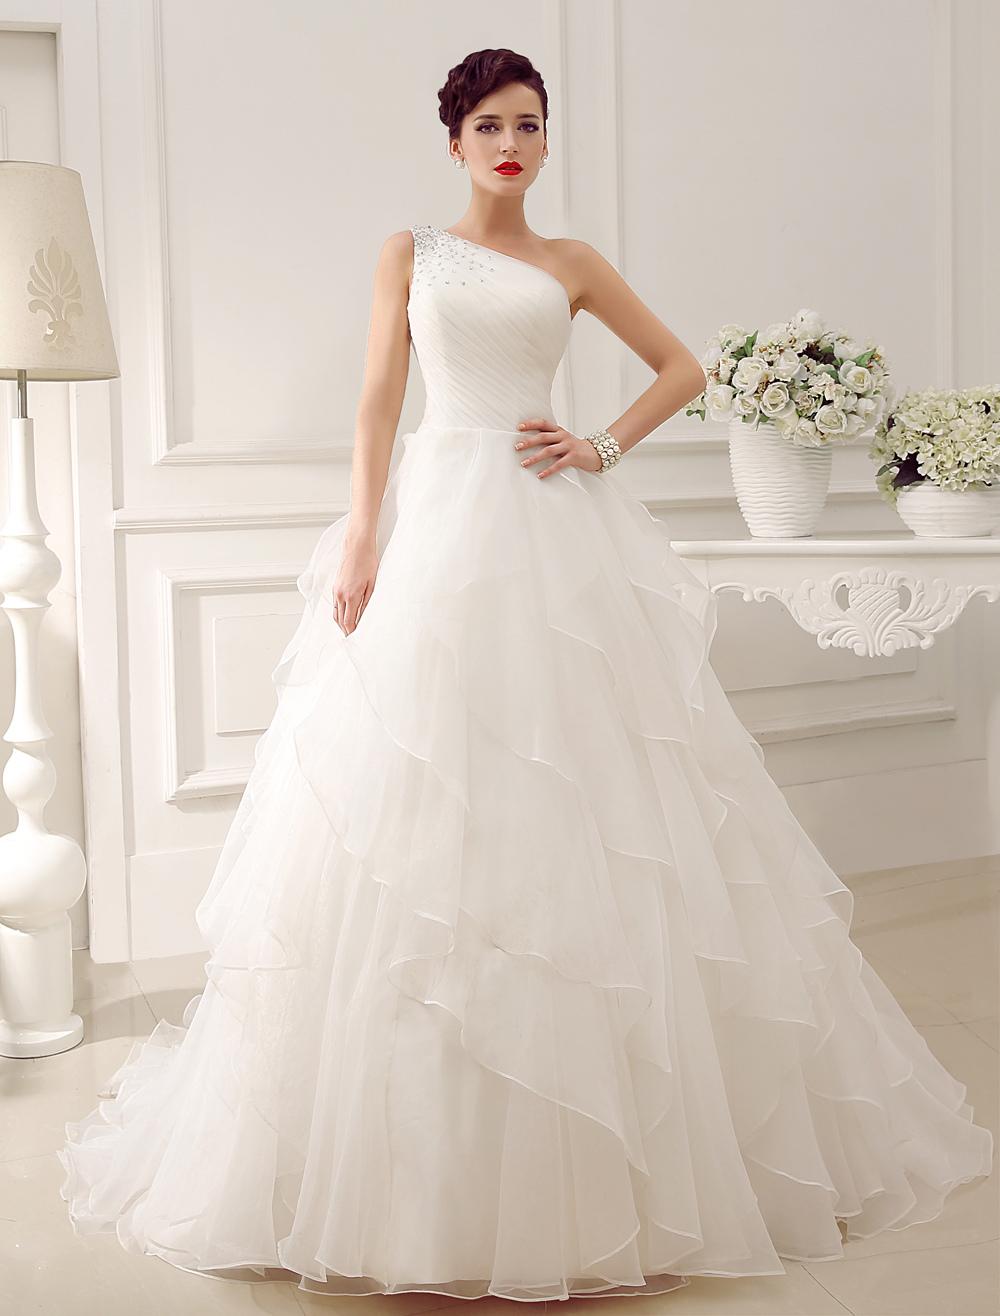 Ivory One-Shoulder Rhinestone Satin Organza Tulle Wedding Dress  Milanoo